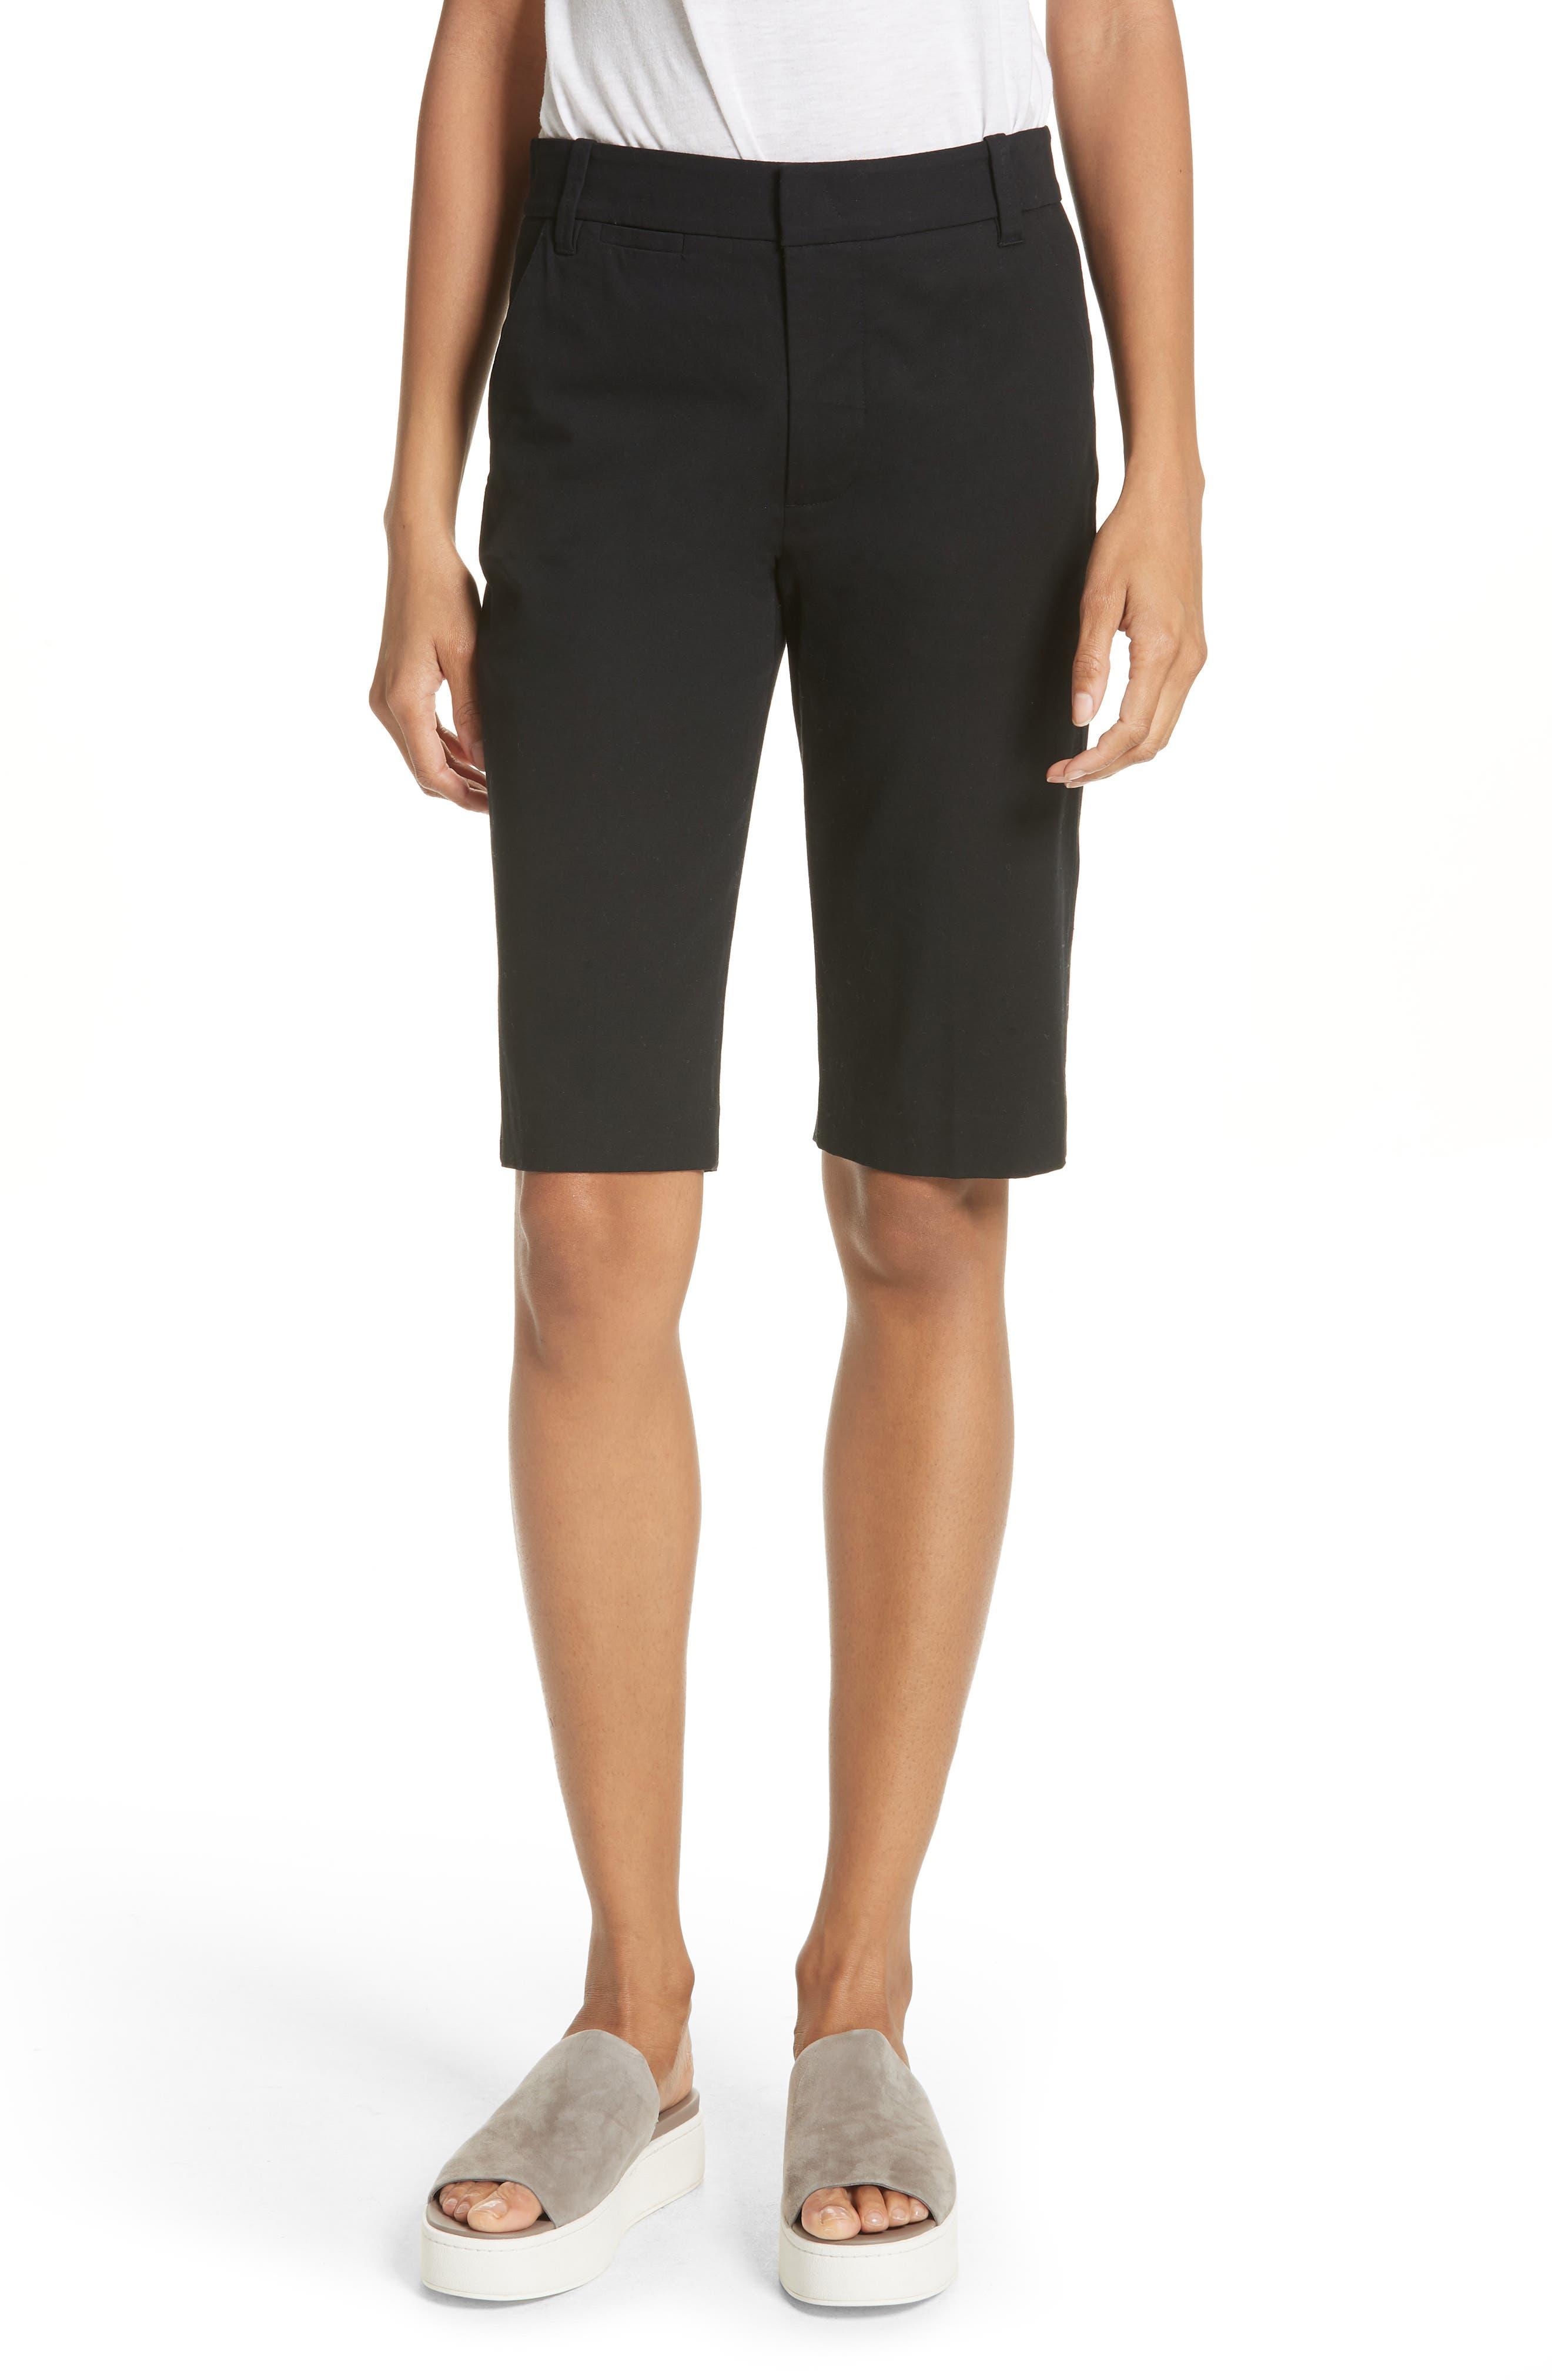 Bermuda Shorts,                         Main,                         color, Black